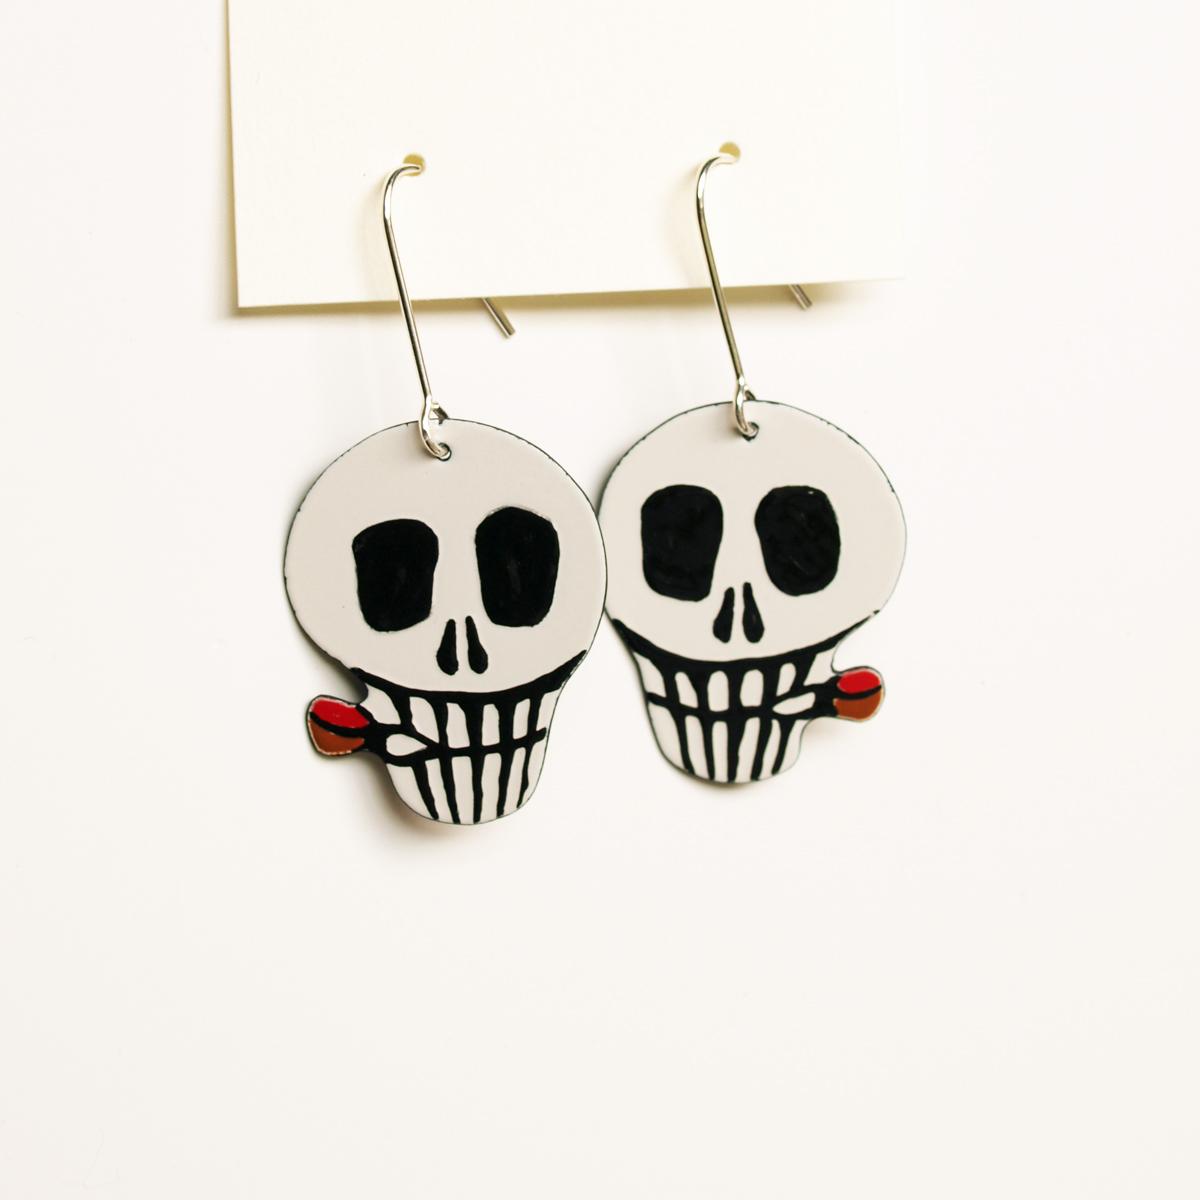 Smoking Skull Earrings